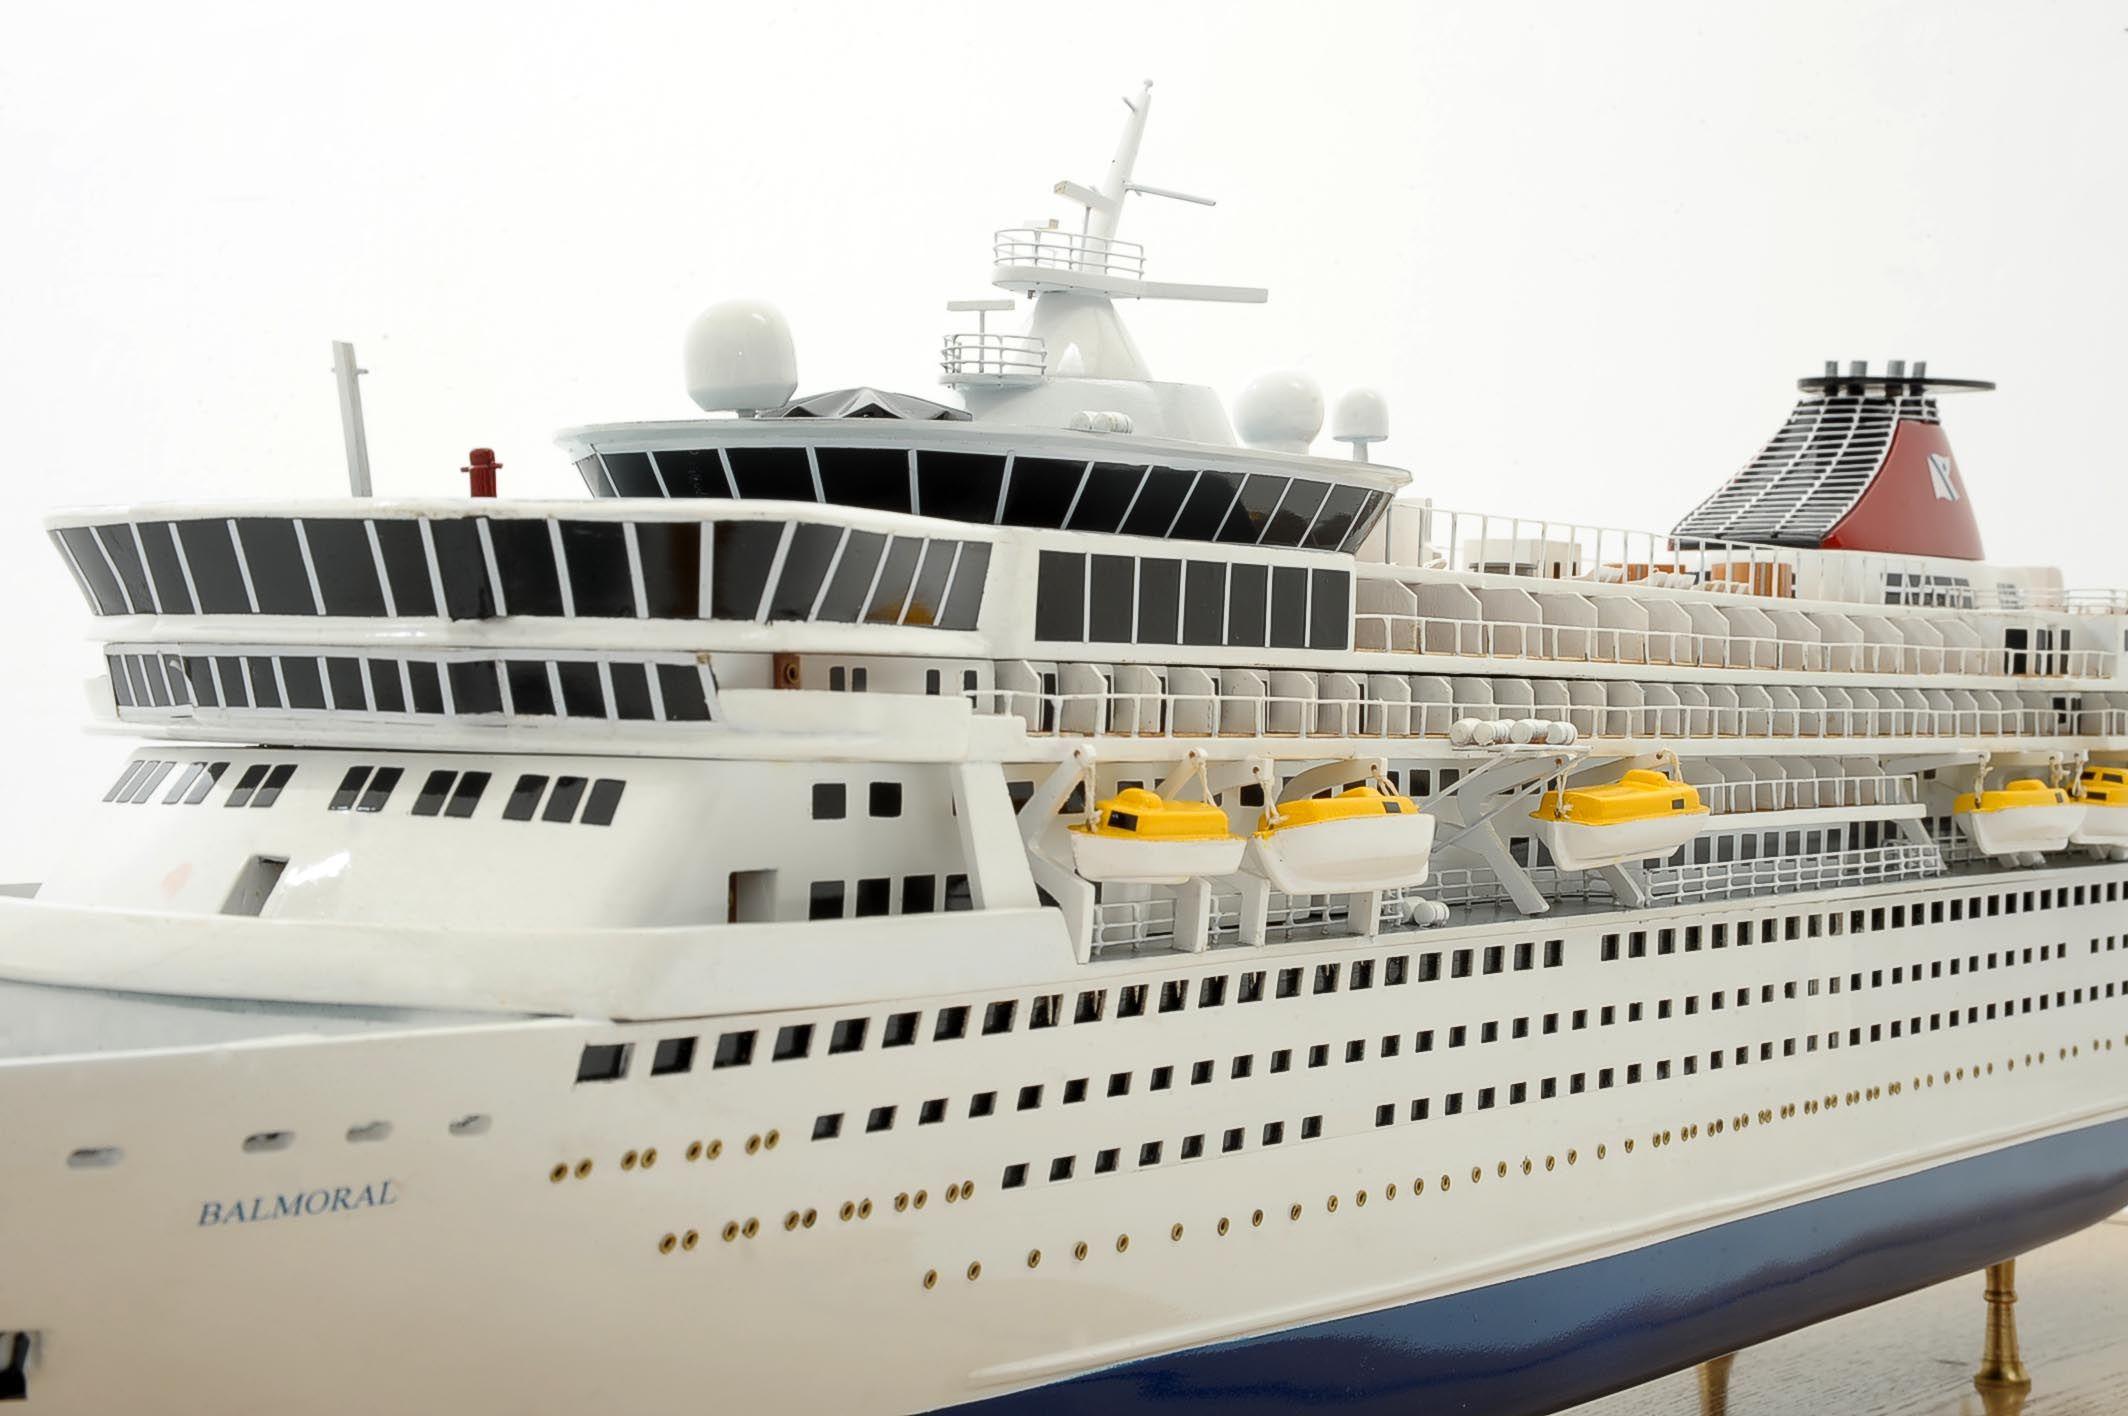 1292-6426-Balmoral-Cruise-Liner